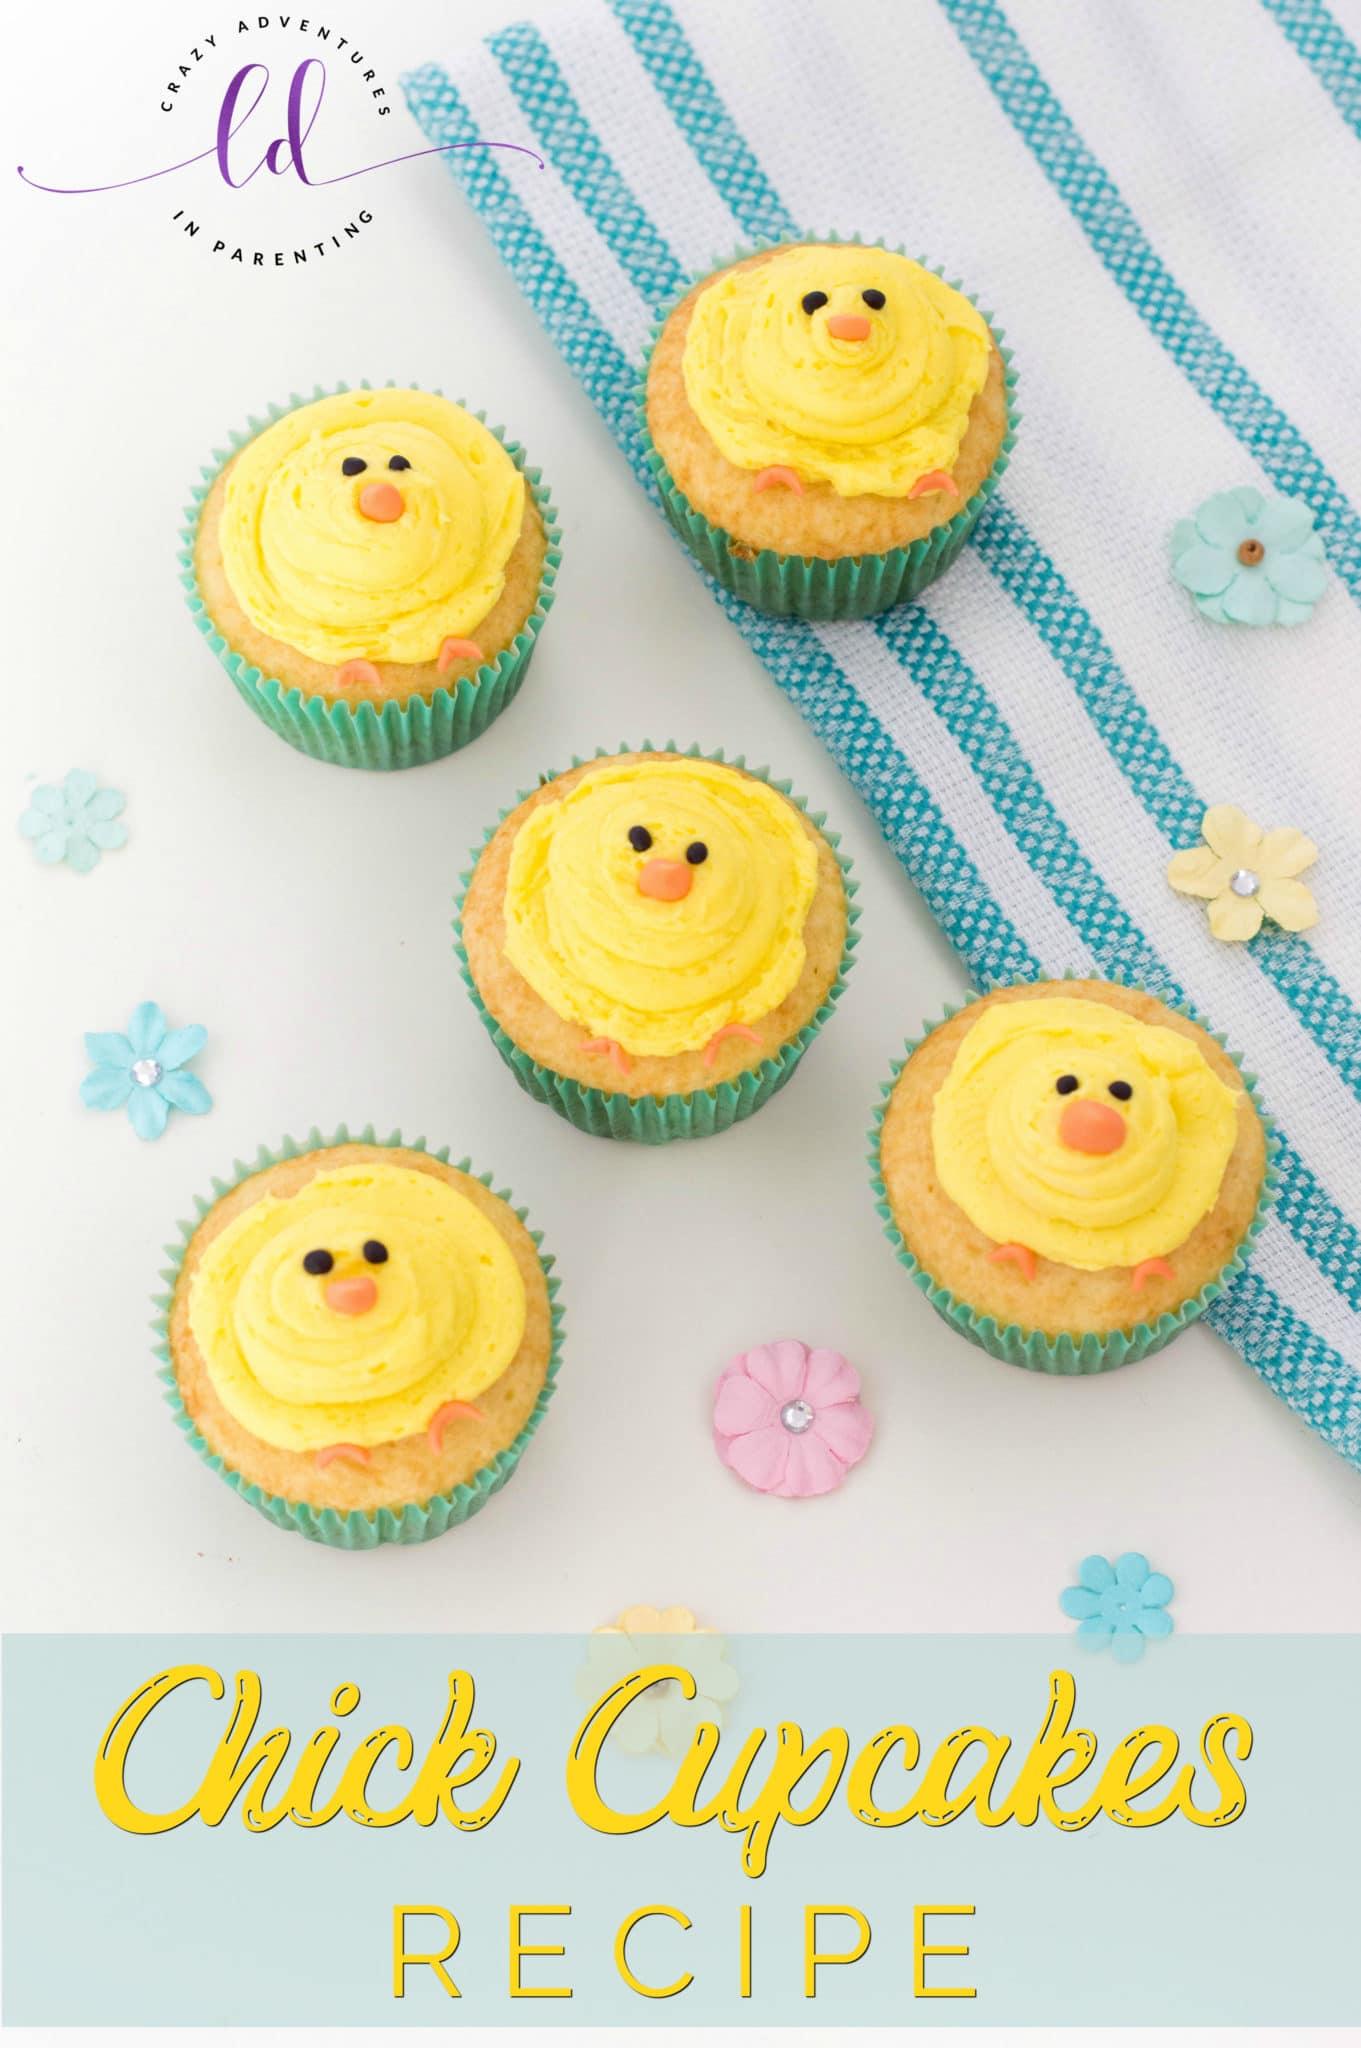 Chick Cupcakes Recipe